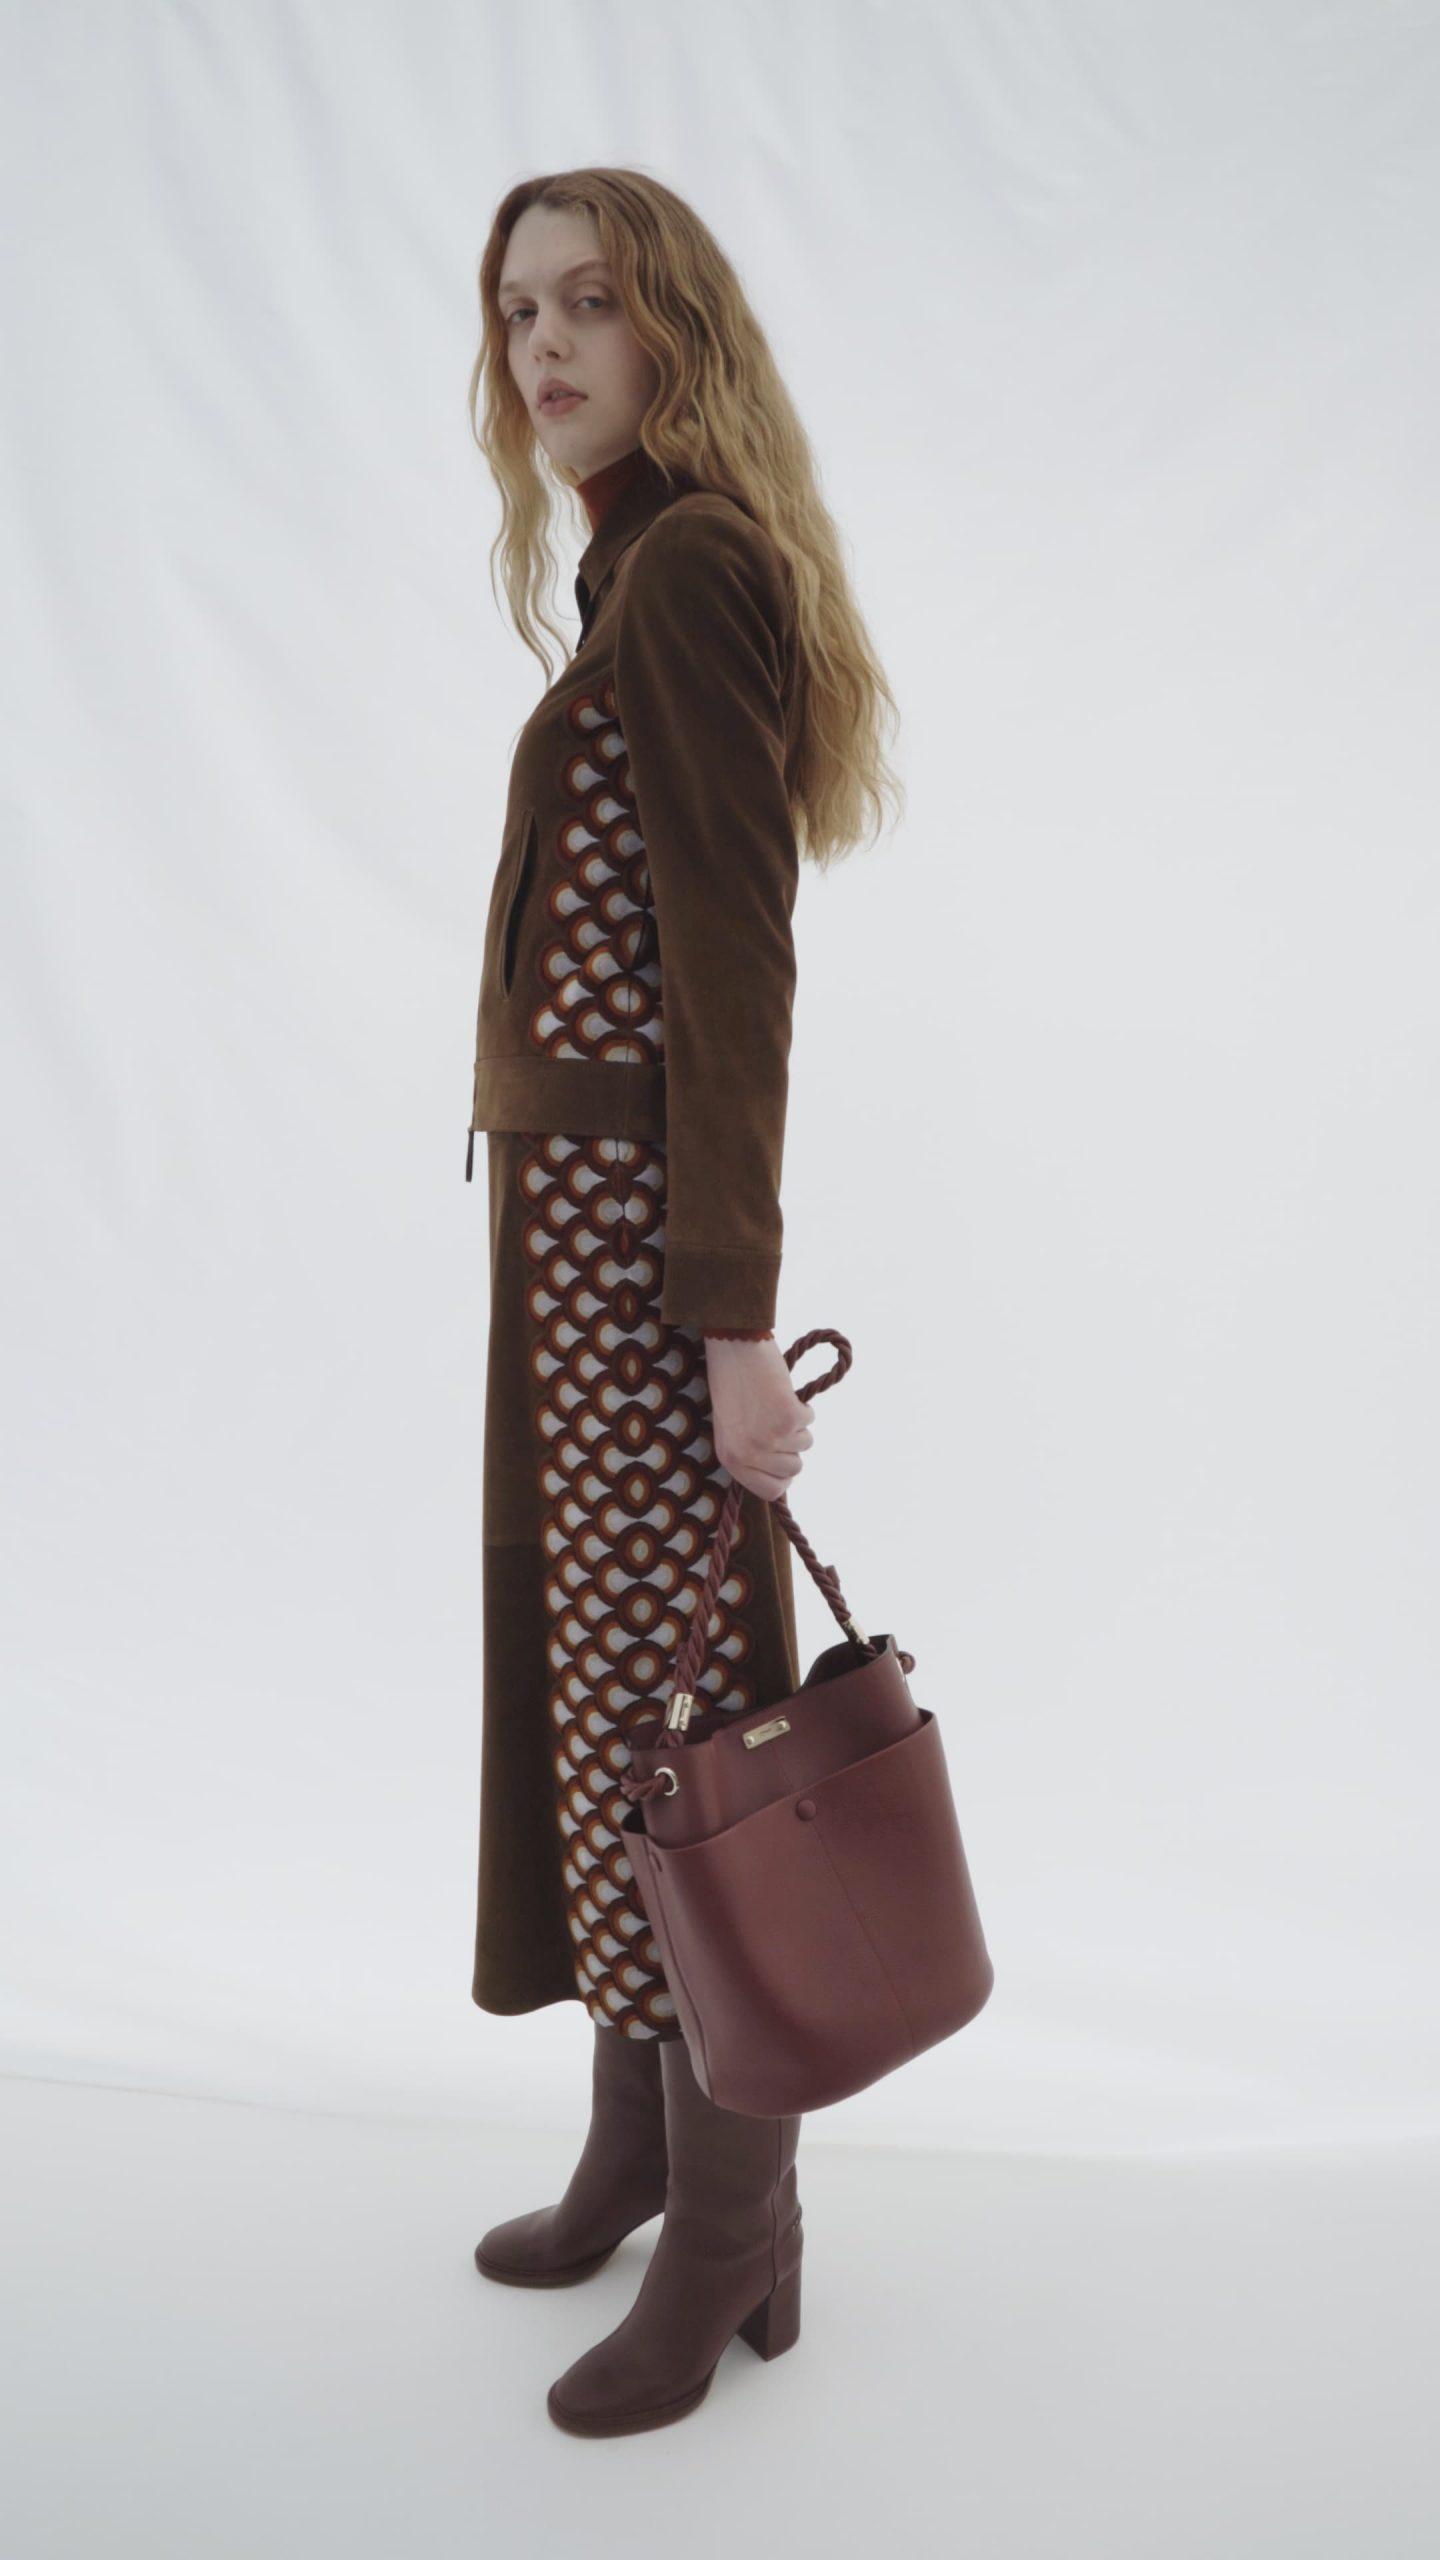 Chloé Resort 2022 Fashion Show Photos